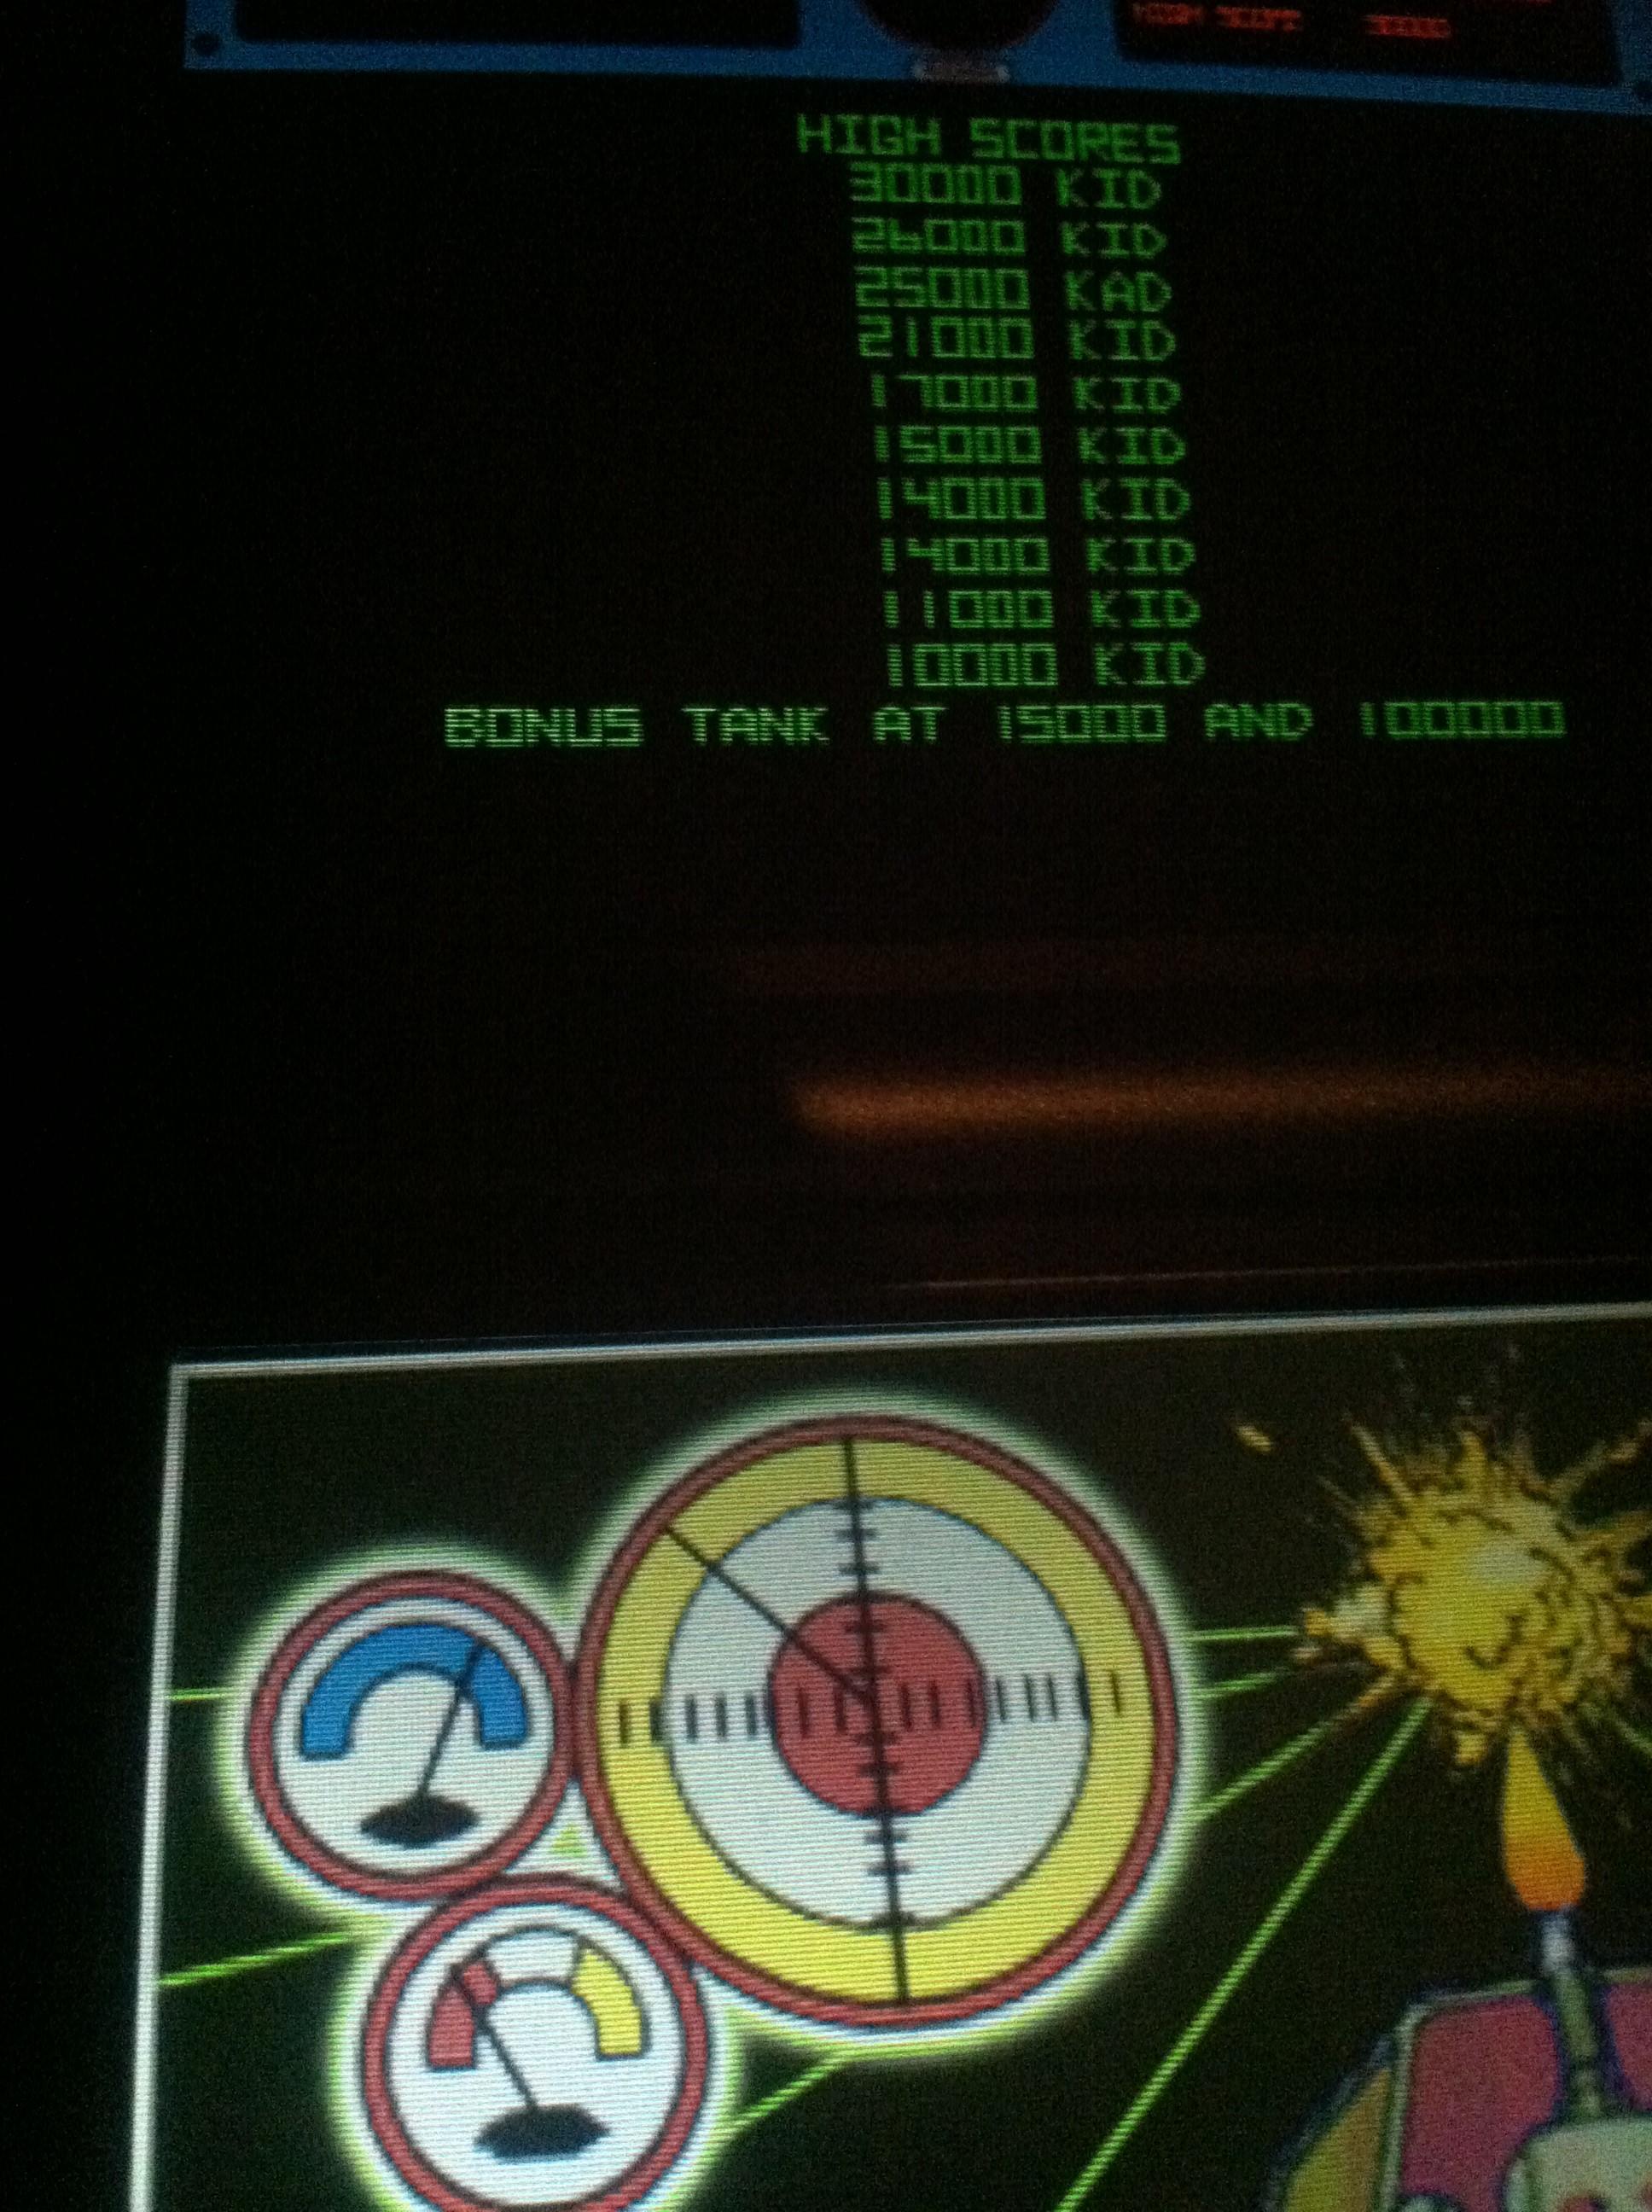 DakotaKid: Atari